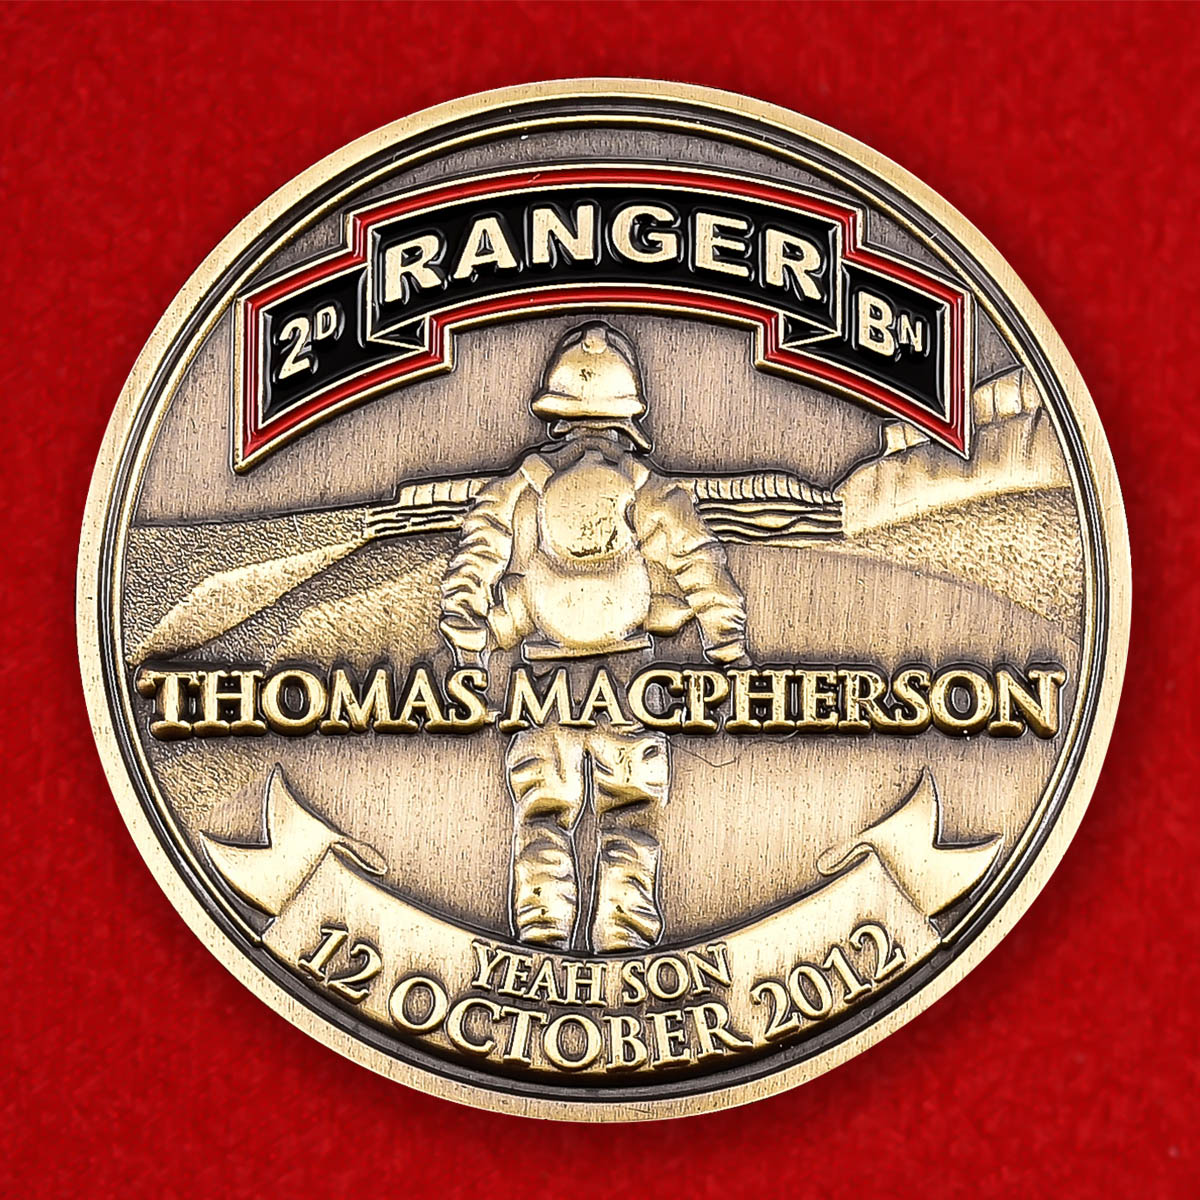 "Монета США ""Памяти сержанта Томаса Макферсона, 2 батальон рейнджеров"""